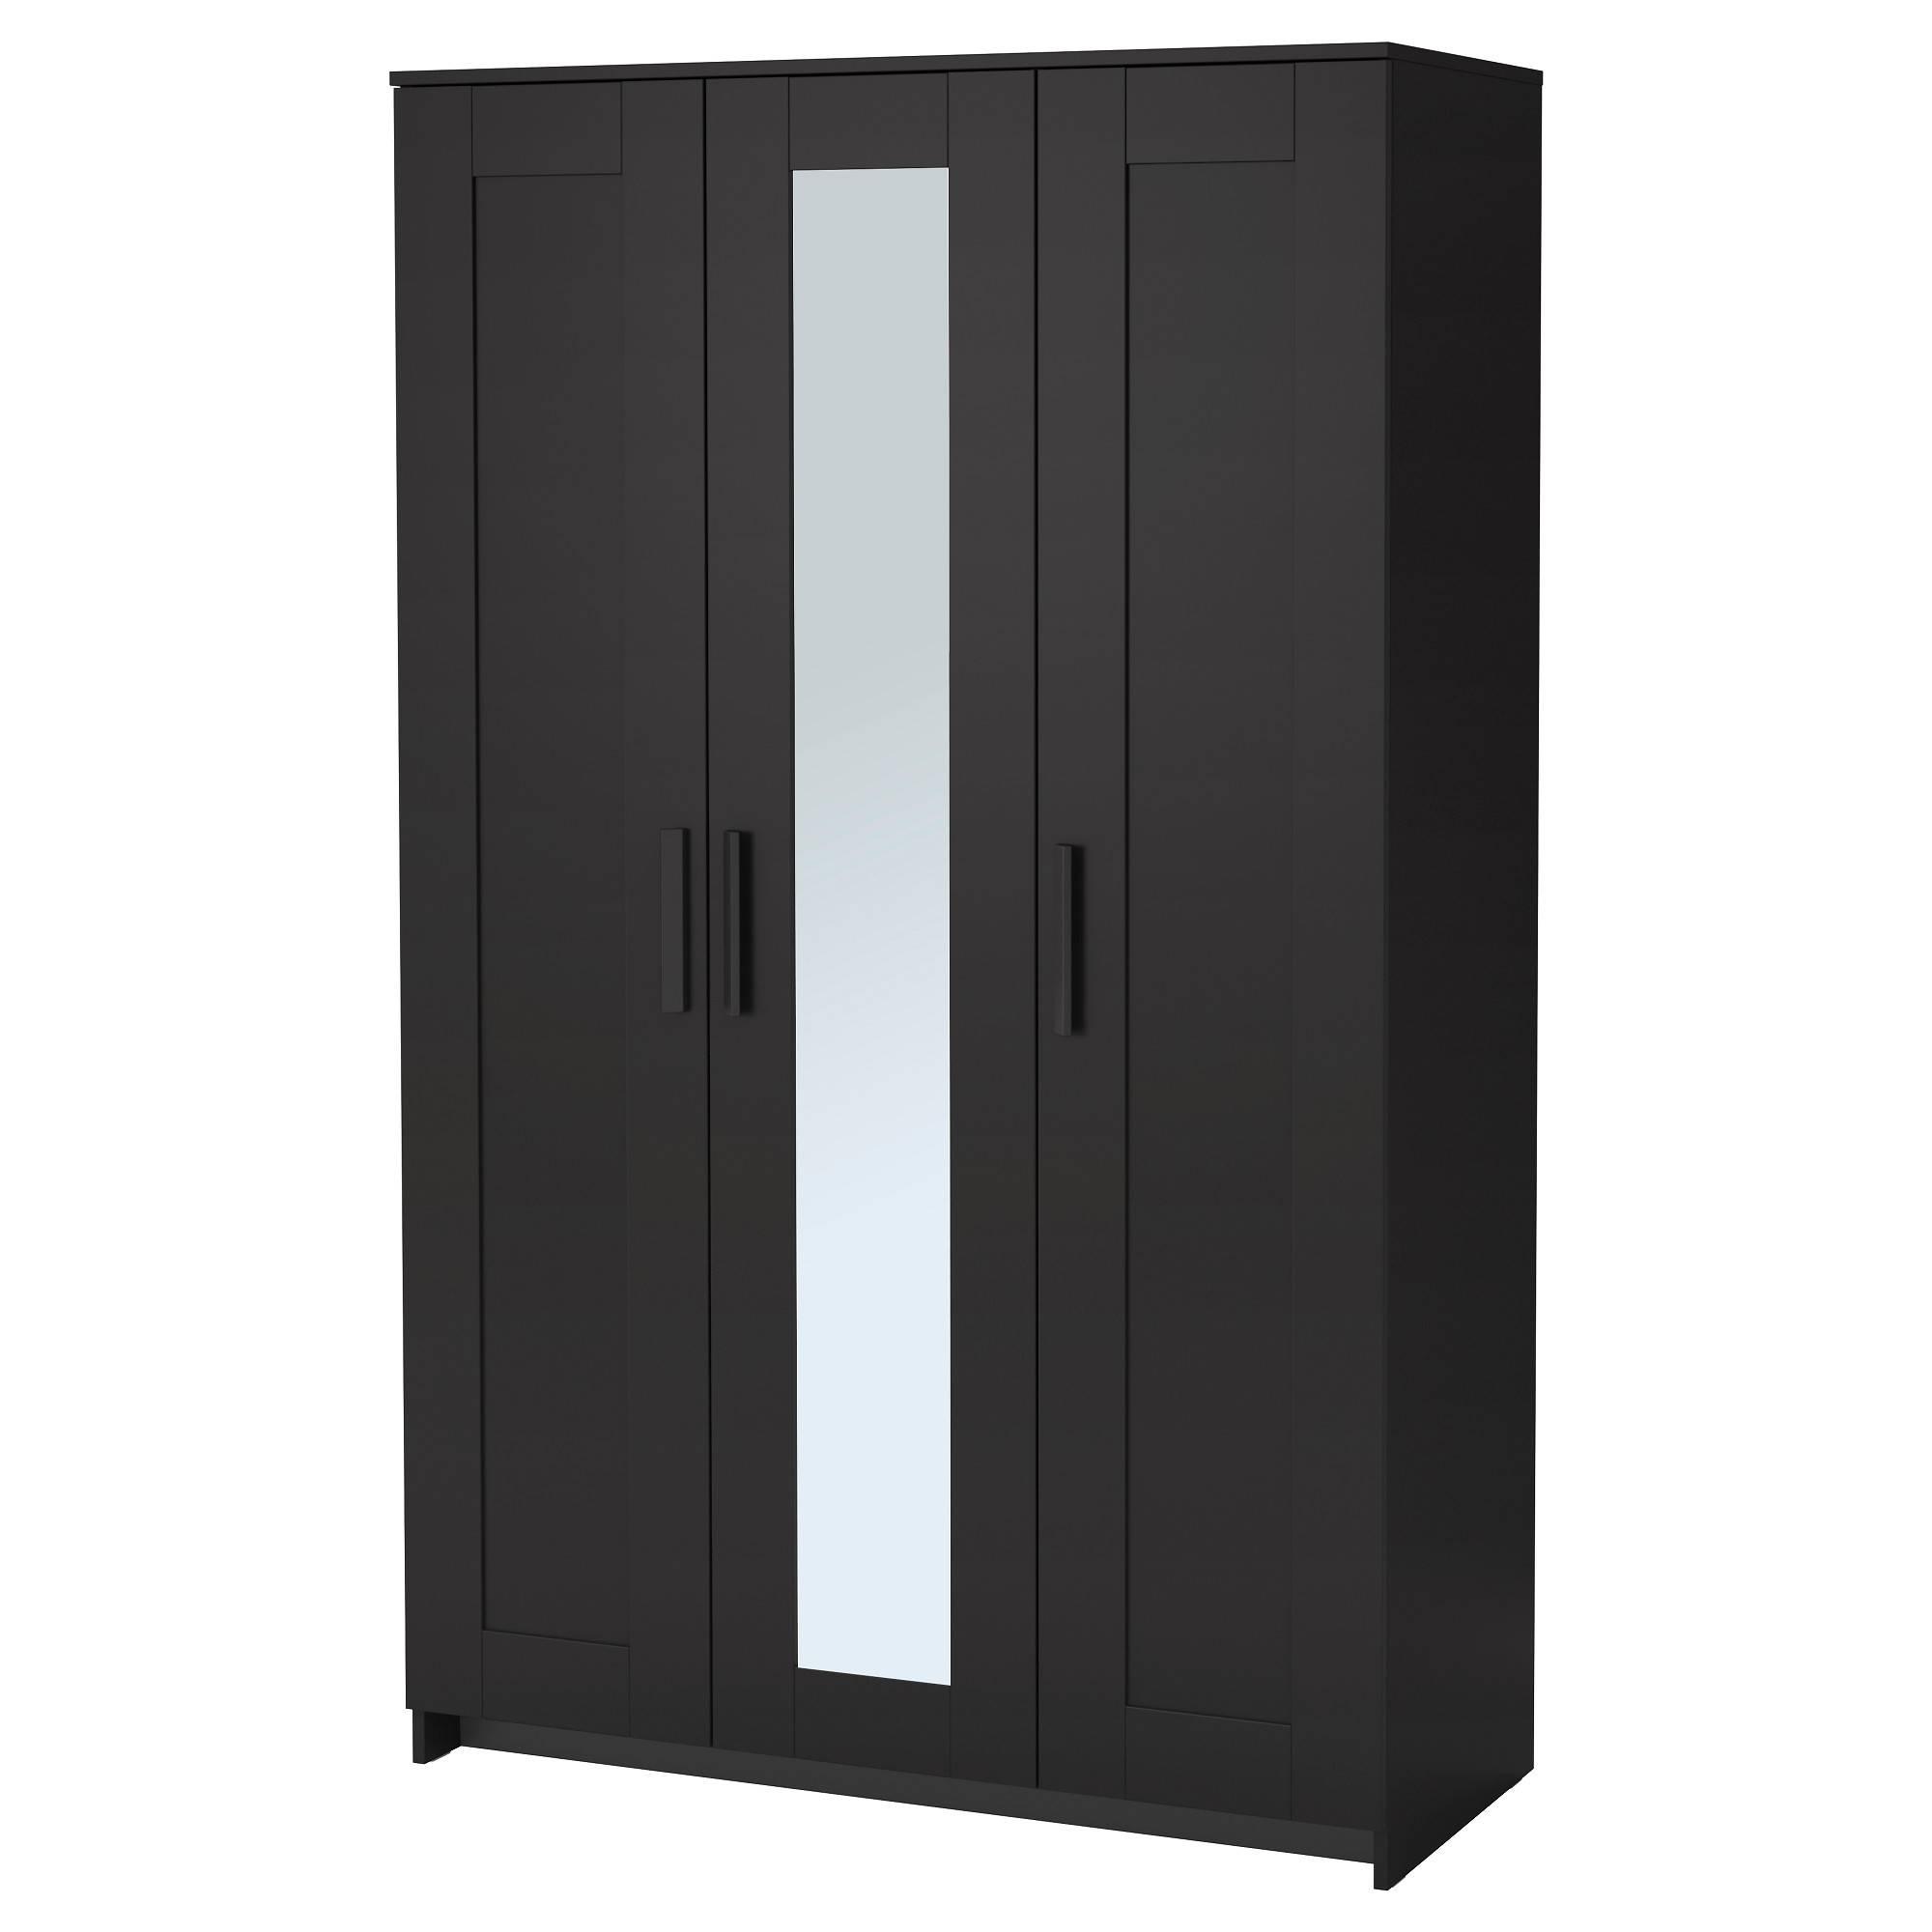 Brimnes Wardrobe With 3 Doors - Black - Ikea within Dark Wood Wardrobe Doors (Image 7 of 30)